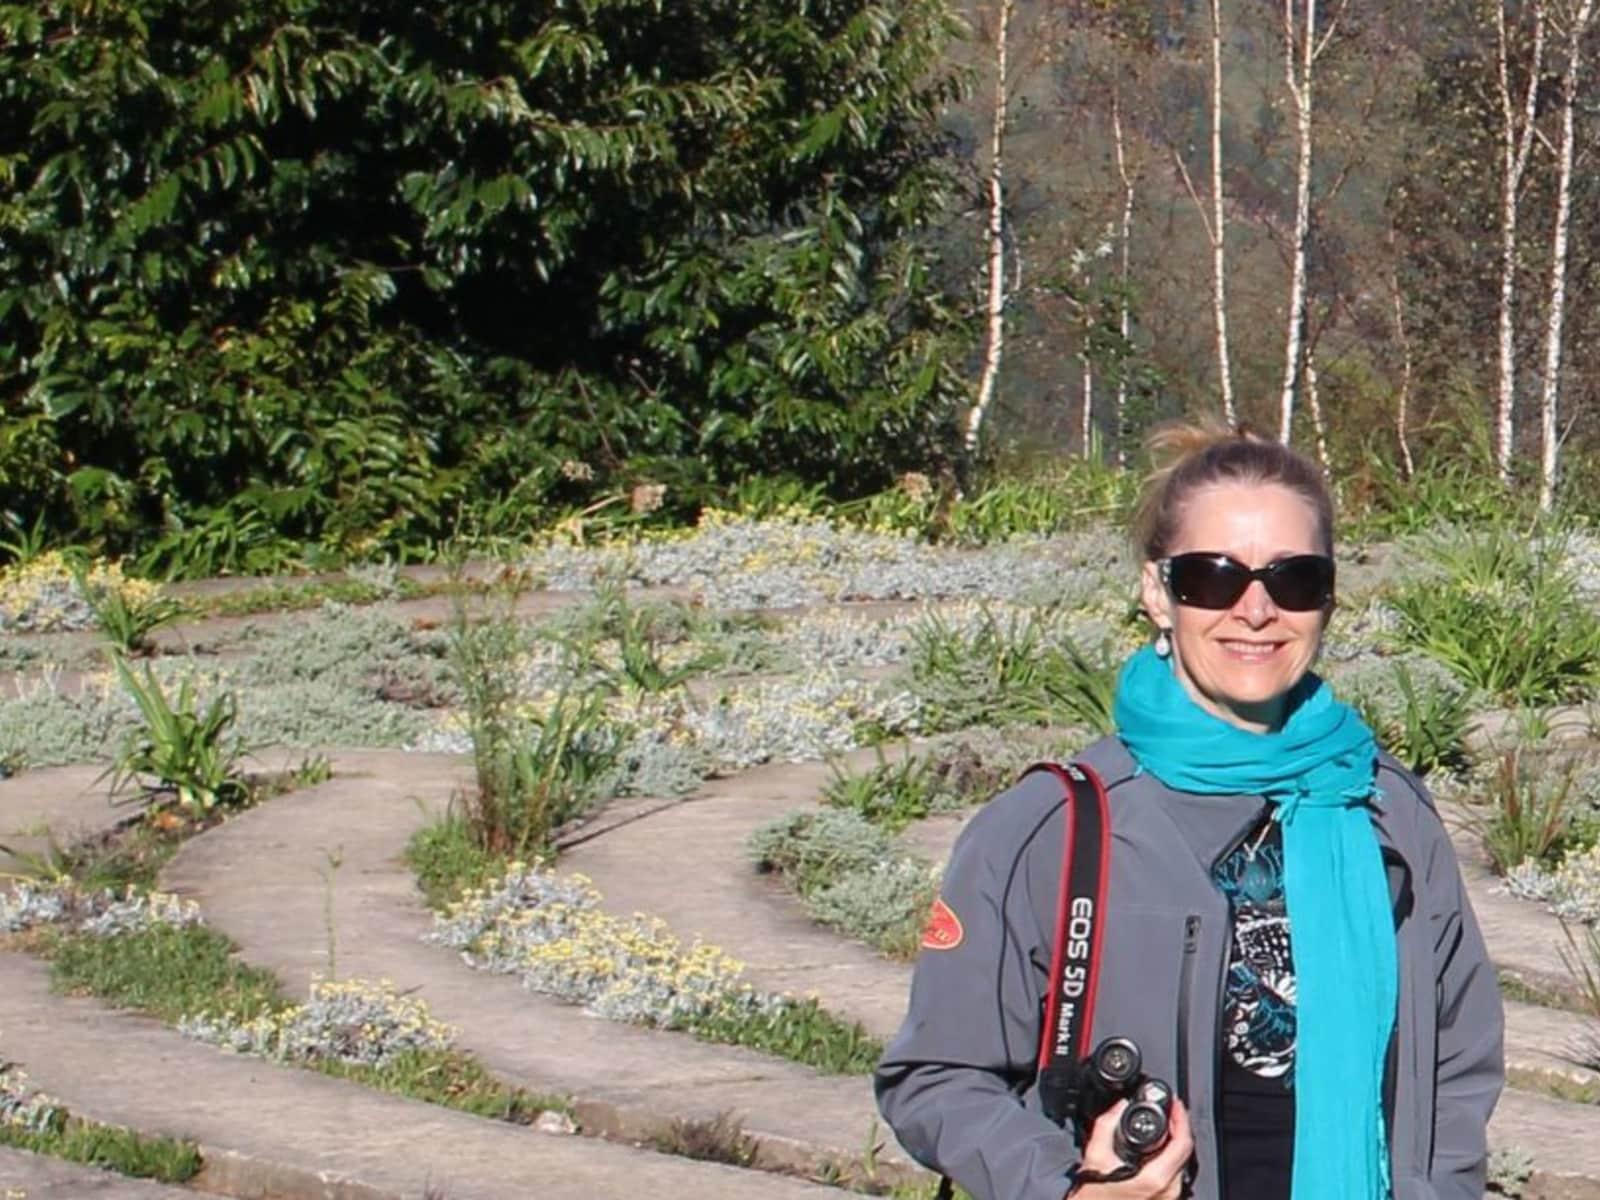 Lesley from Gold Coast, Queensland, Australia